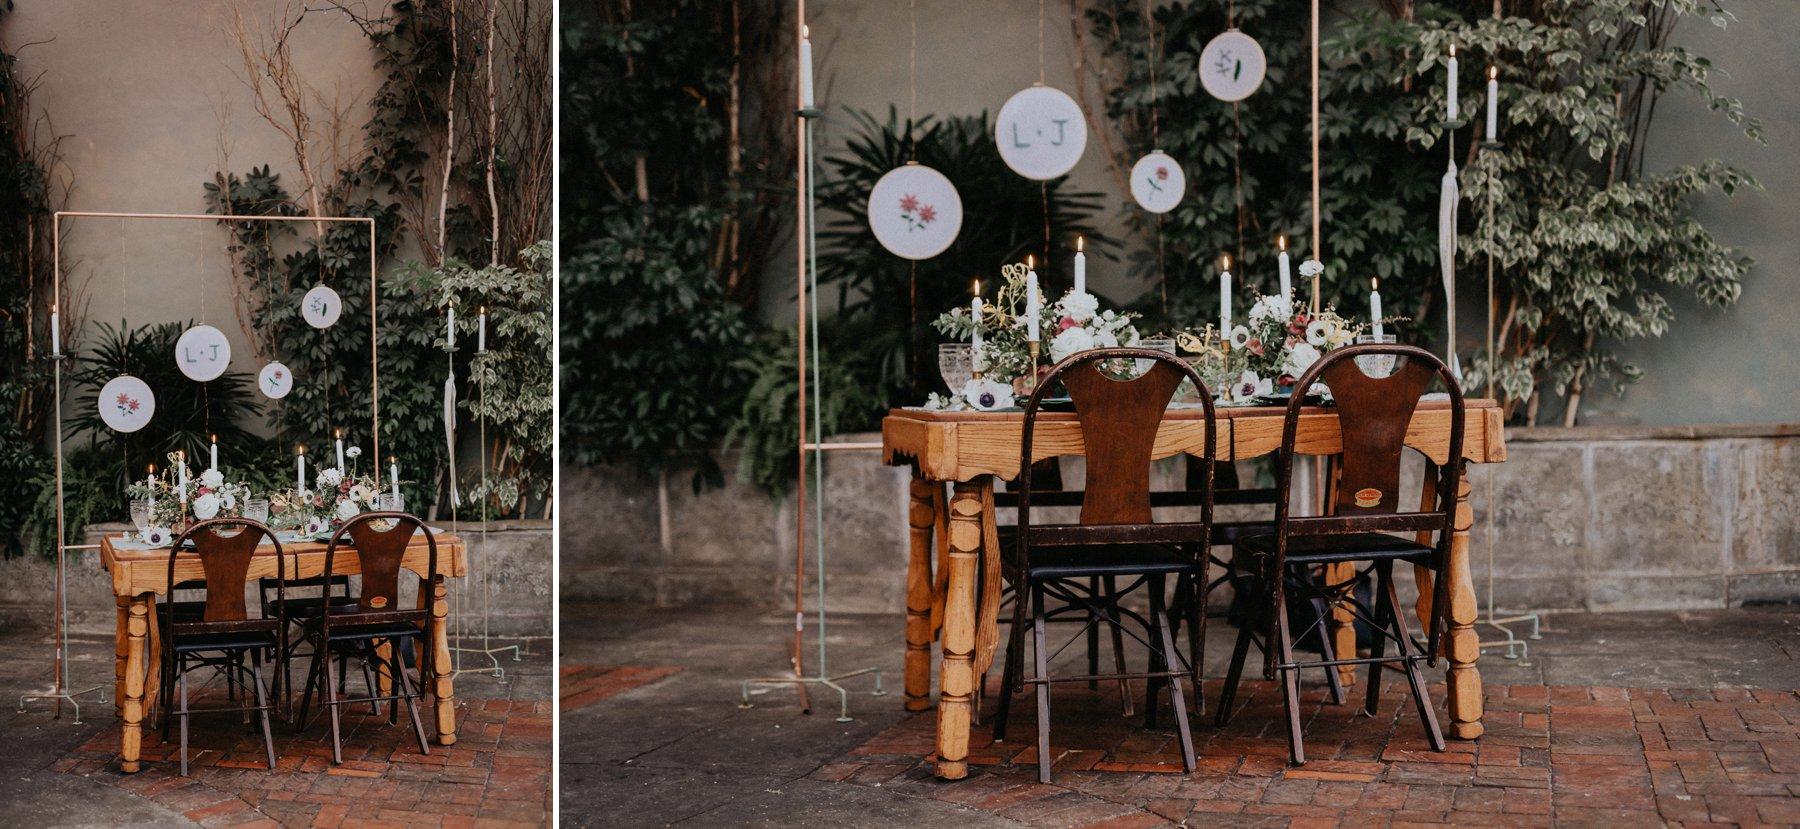 greenhouse-botanical-wedding-25.jpg